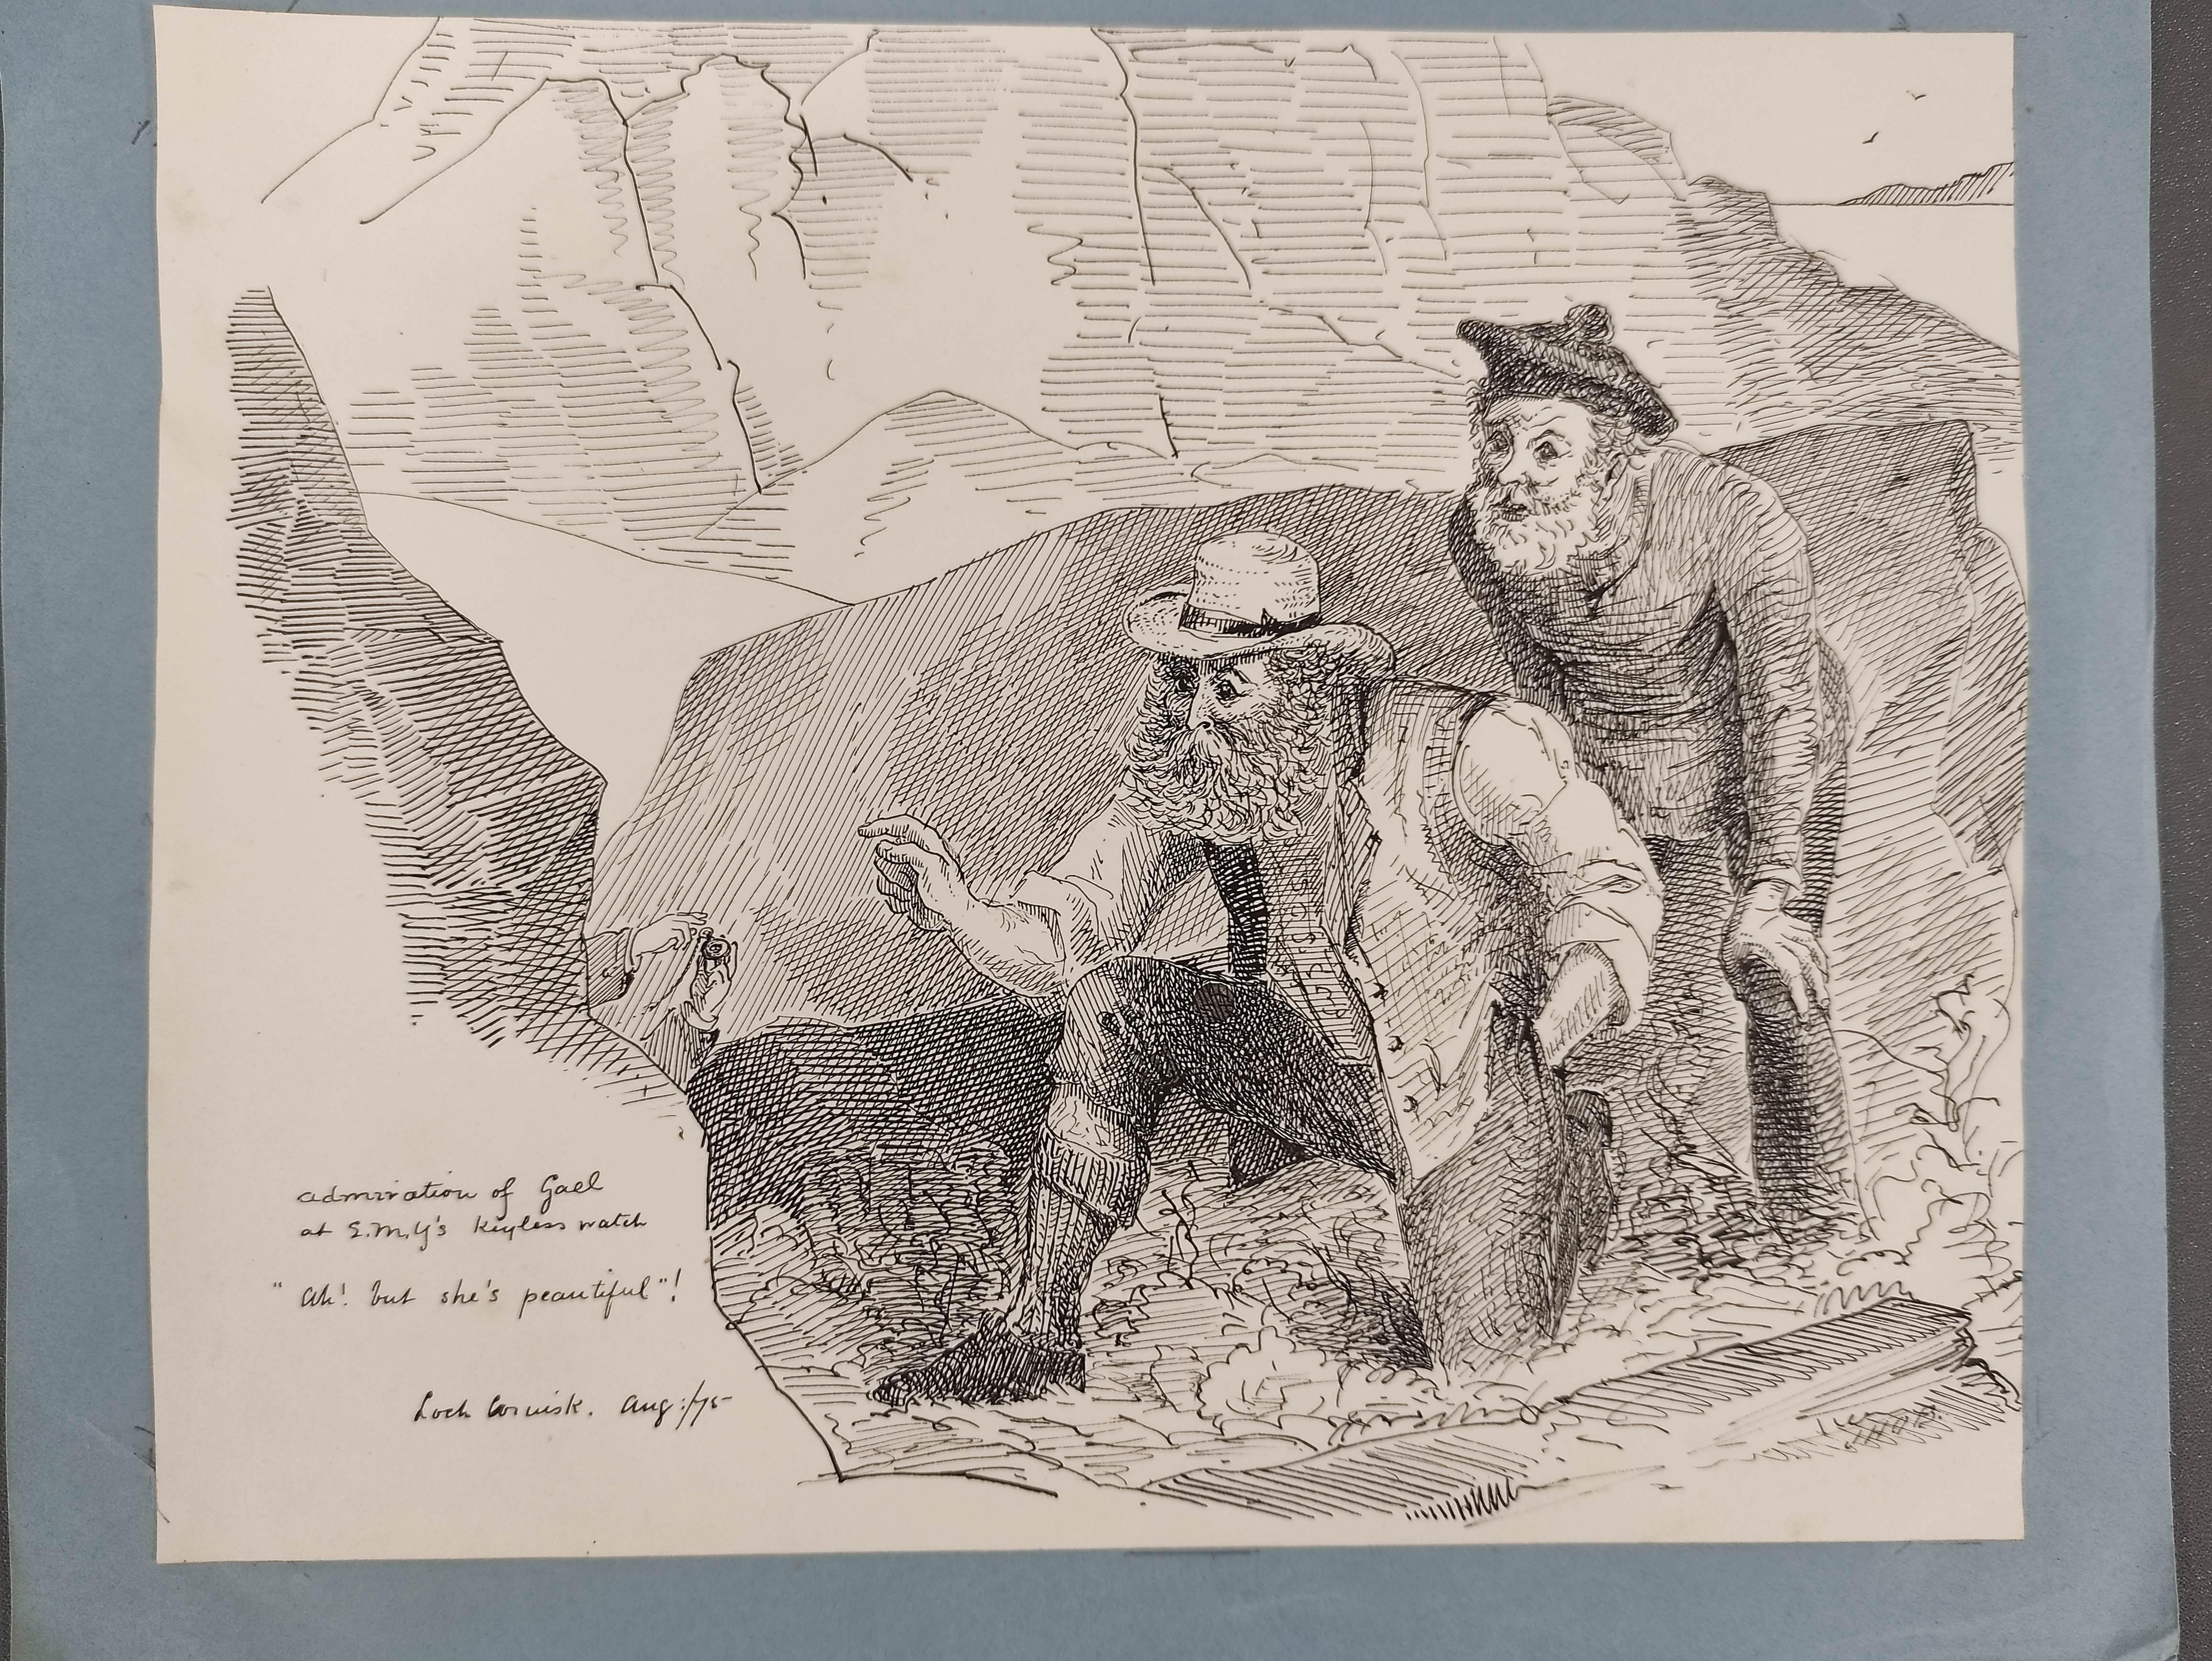 J.H.O.B.- original artwork. 8 comic pen & ink drawings made on a visit to Skye, 1875. - Image 2 of 7